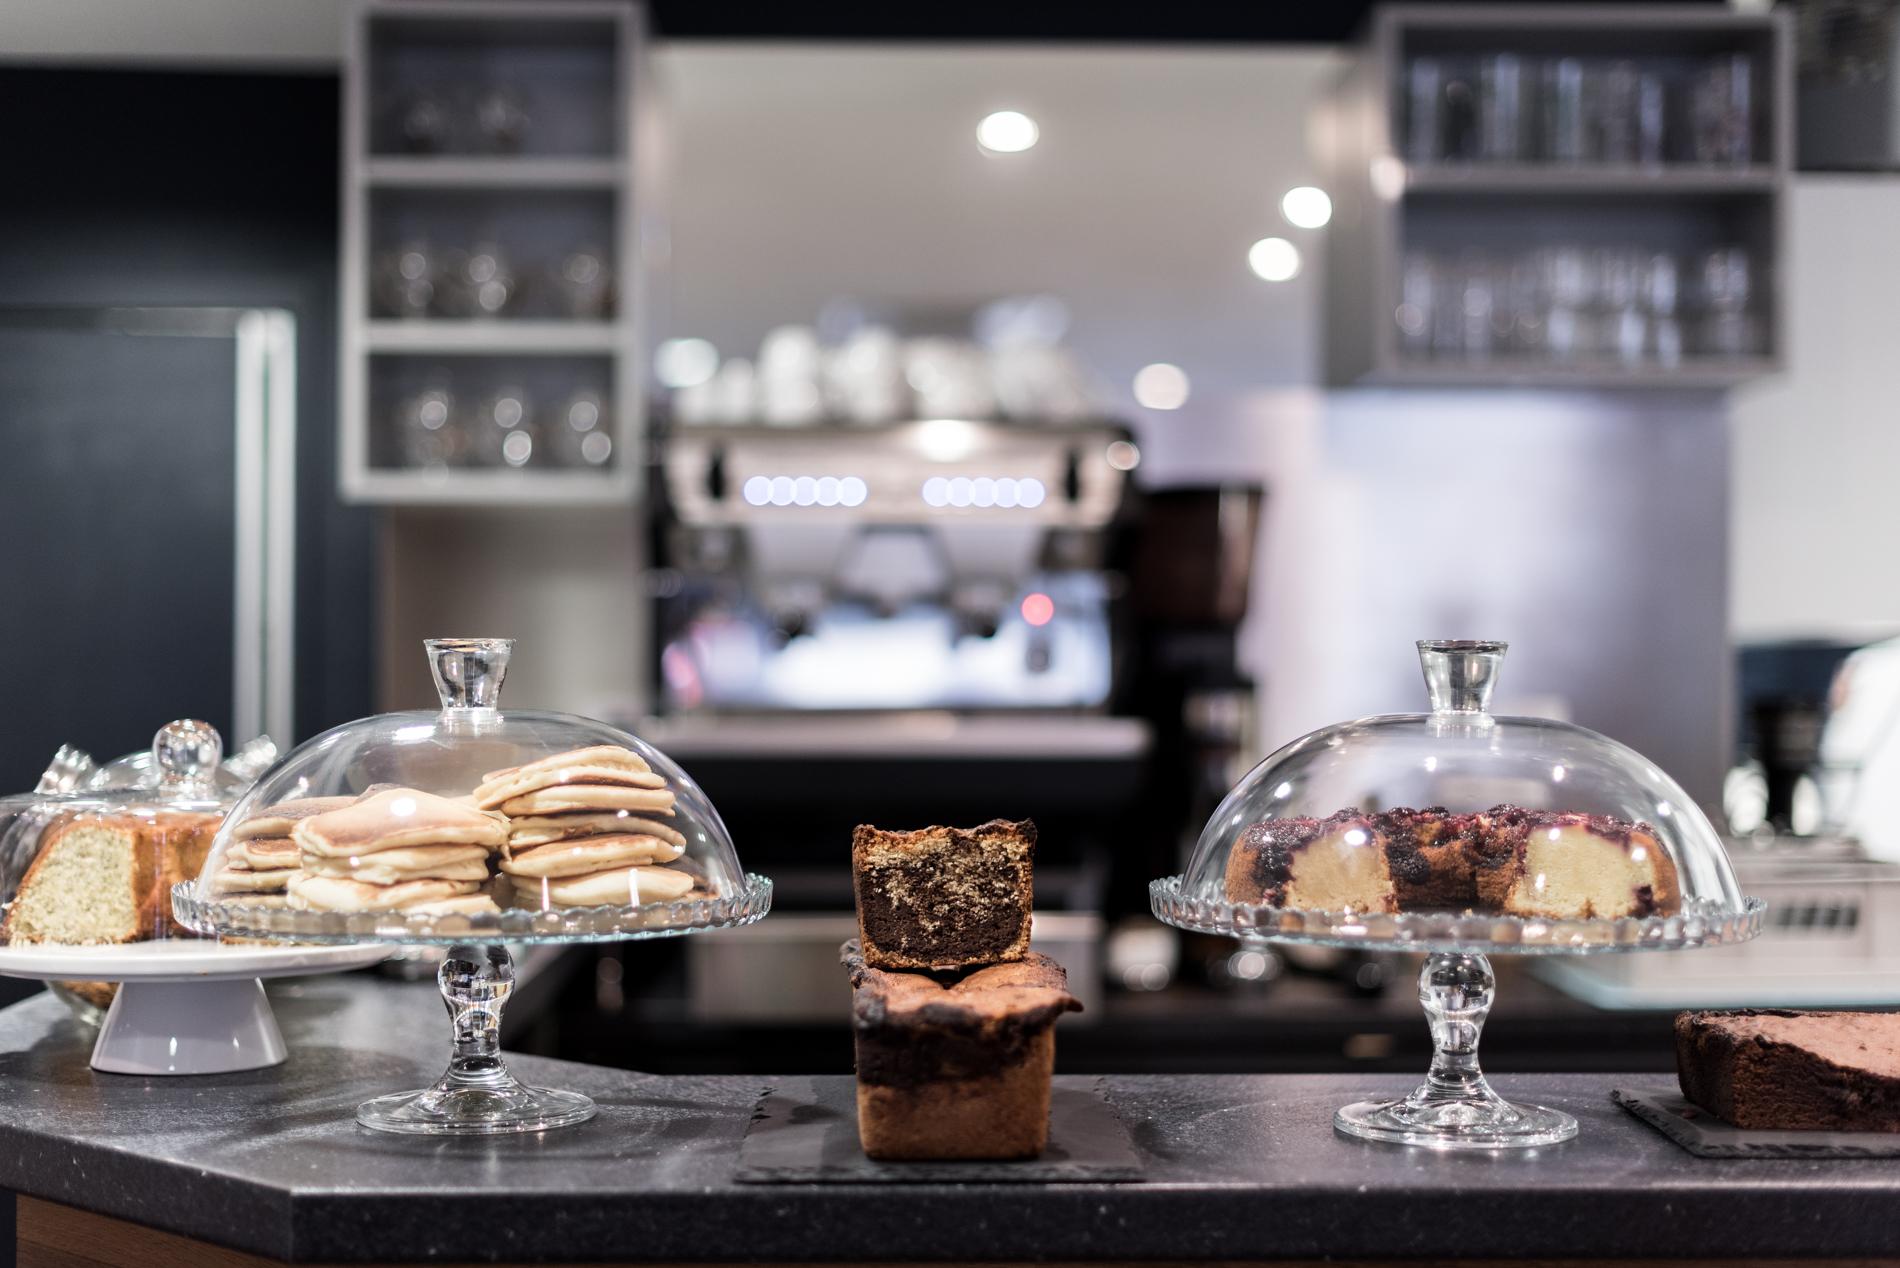 Gateau fait maison auRestaurant Kitchen Dada à Bayonne